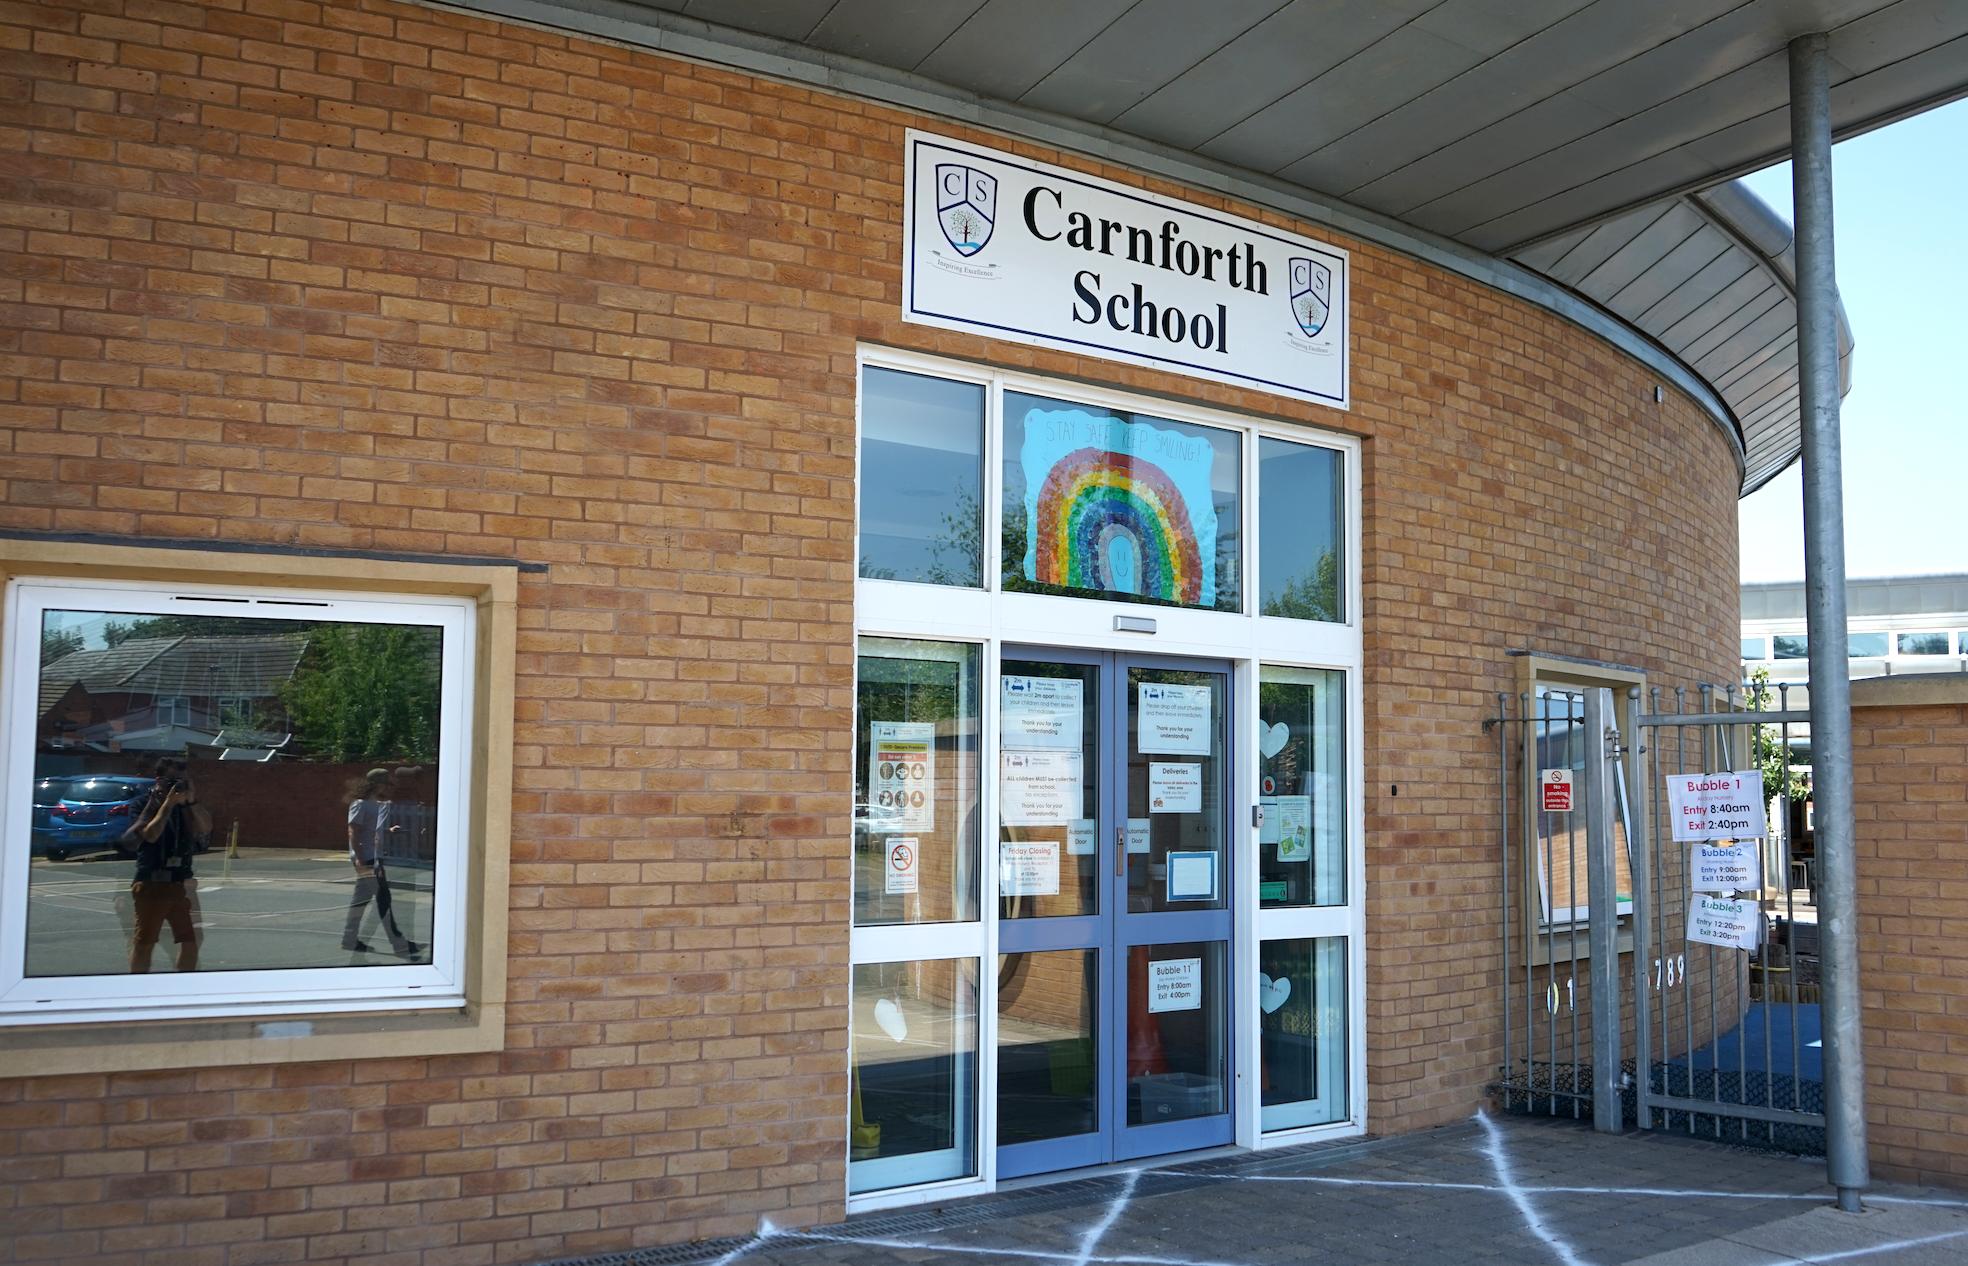 Carnforth School Black Pear Trust